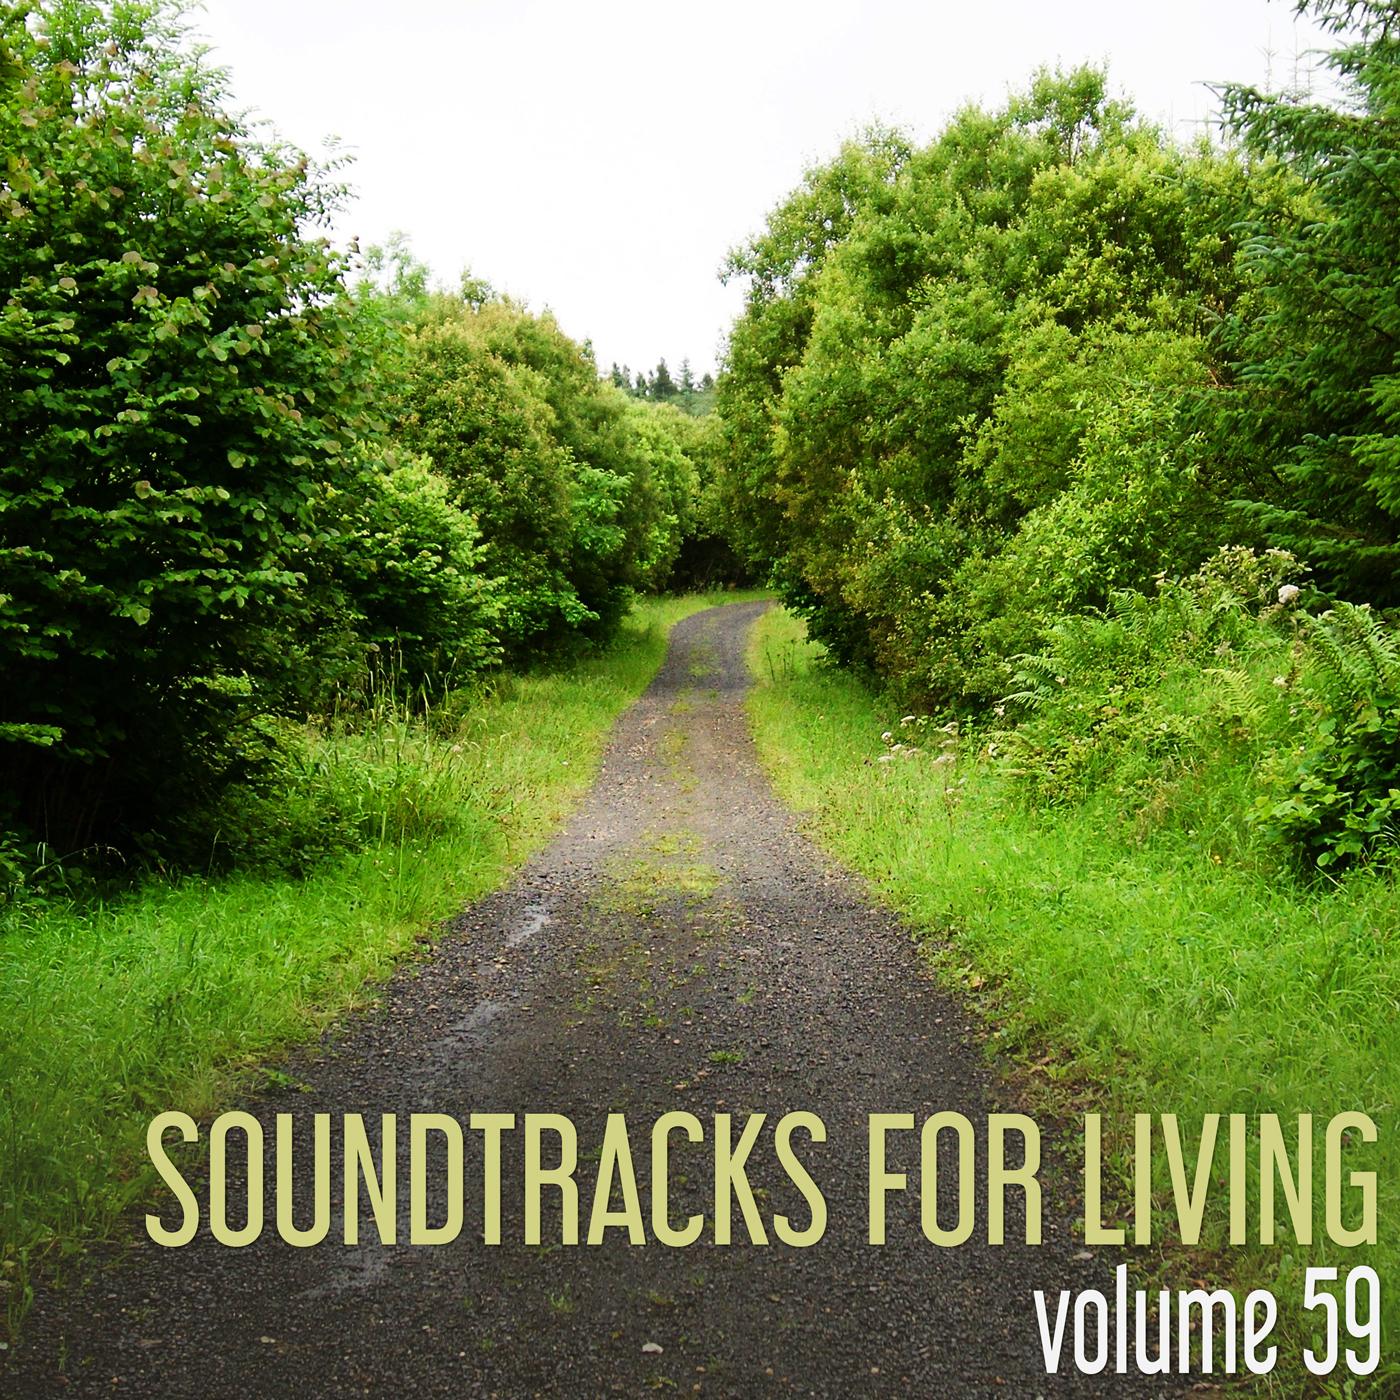 SFL - Volume 59